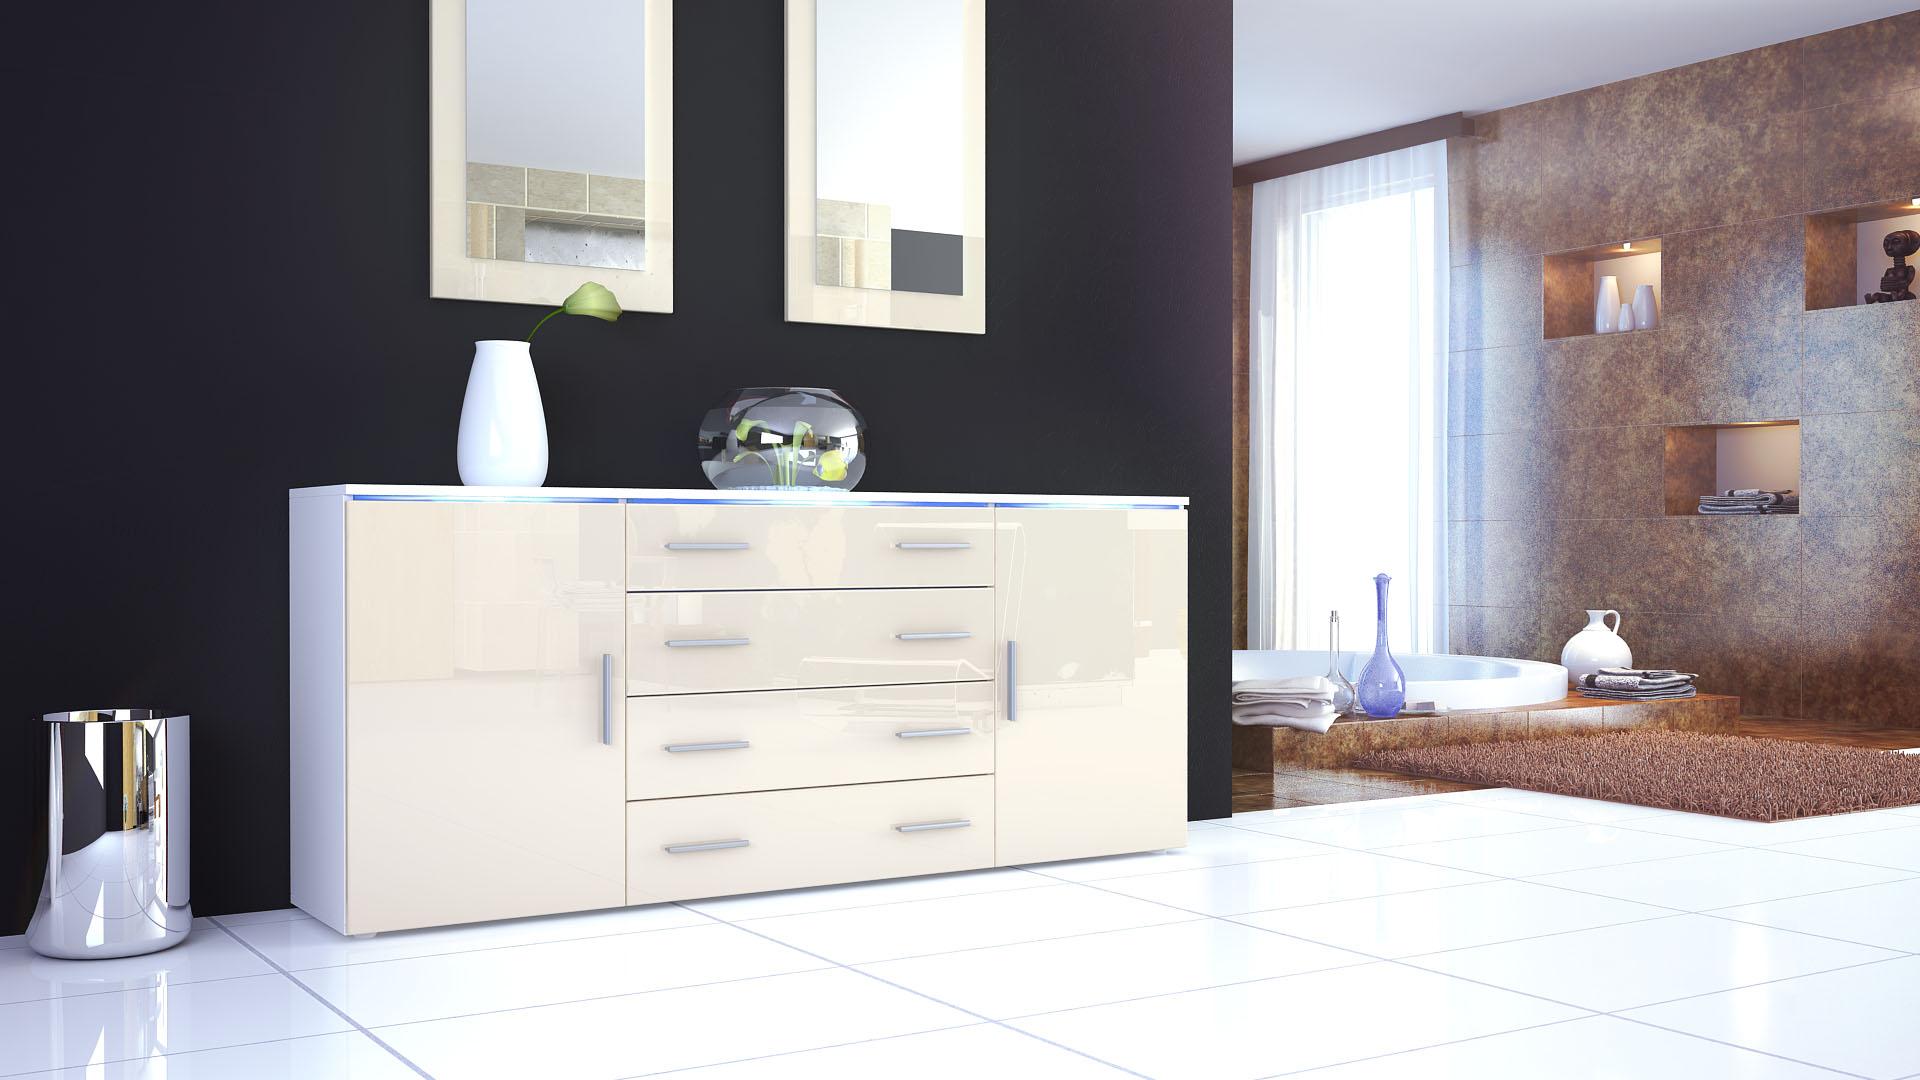 sideboard kommode highboard 170cm tv schrank anrichte faro v2 wei hochglanz ebay. Black Bedroom Furniture Sets. Home Design Ideas